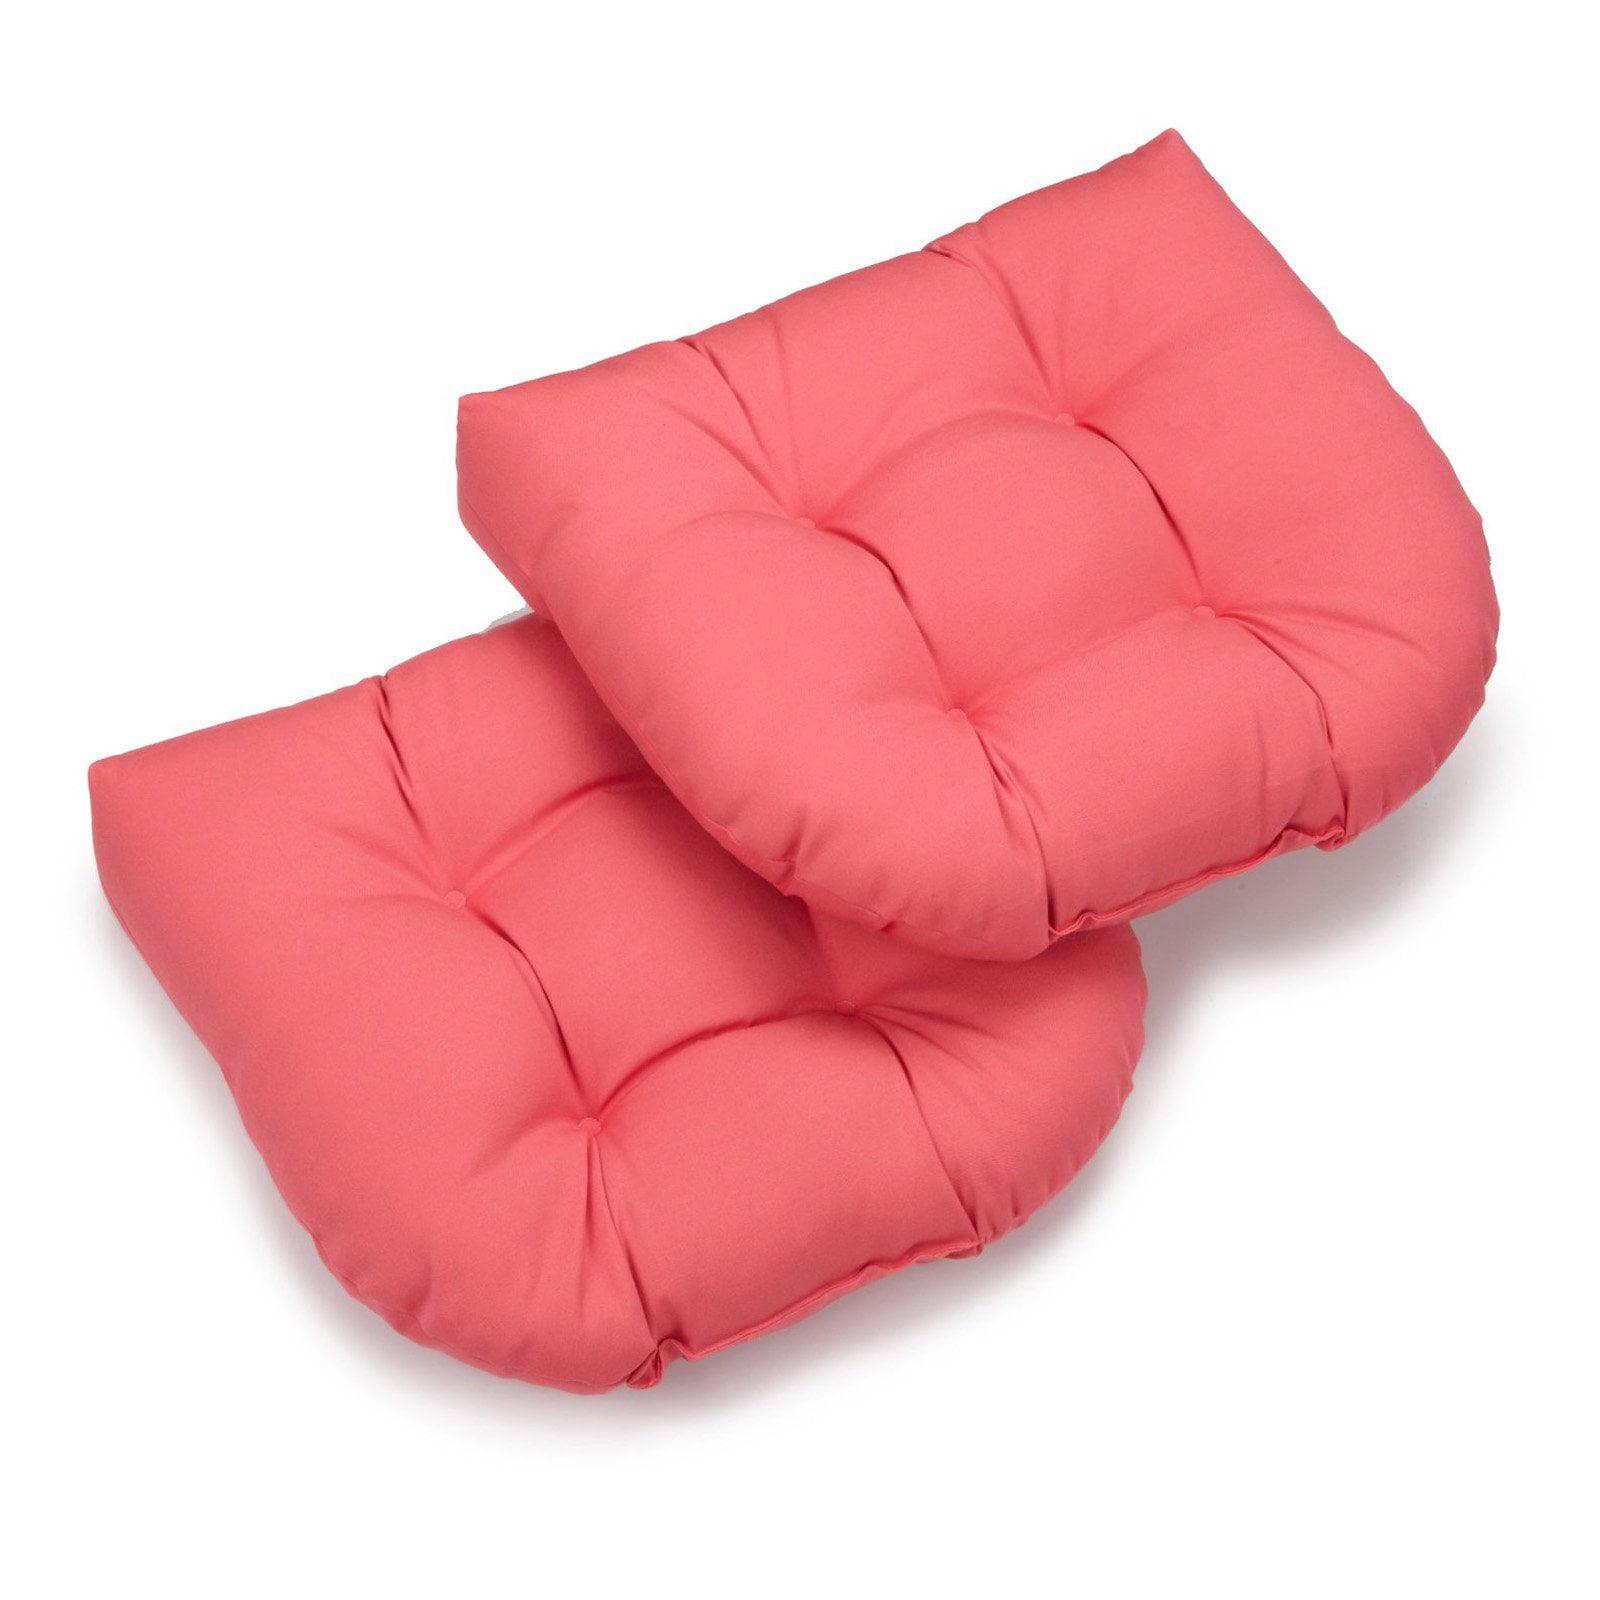 Blazing Needles Twill U-Shaped Indoor Chair Cushion - Set of 2